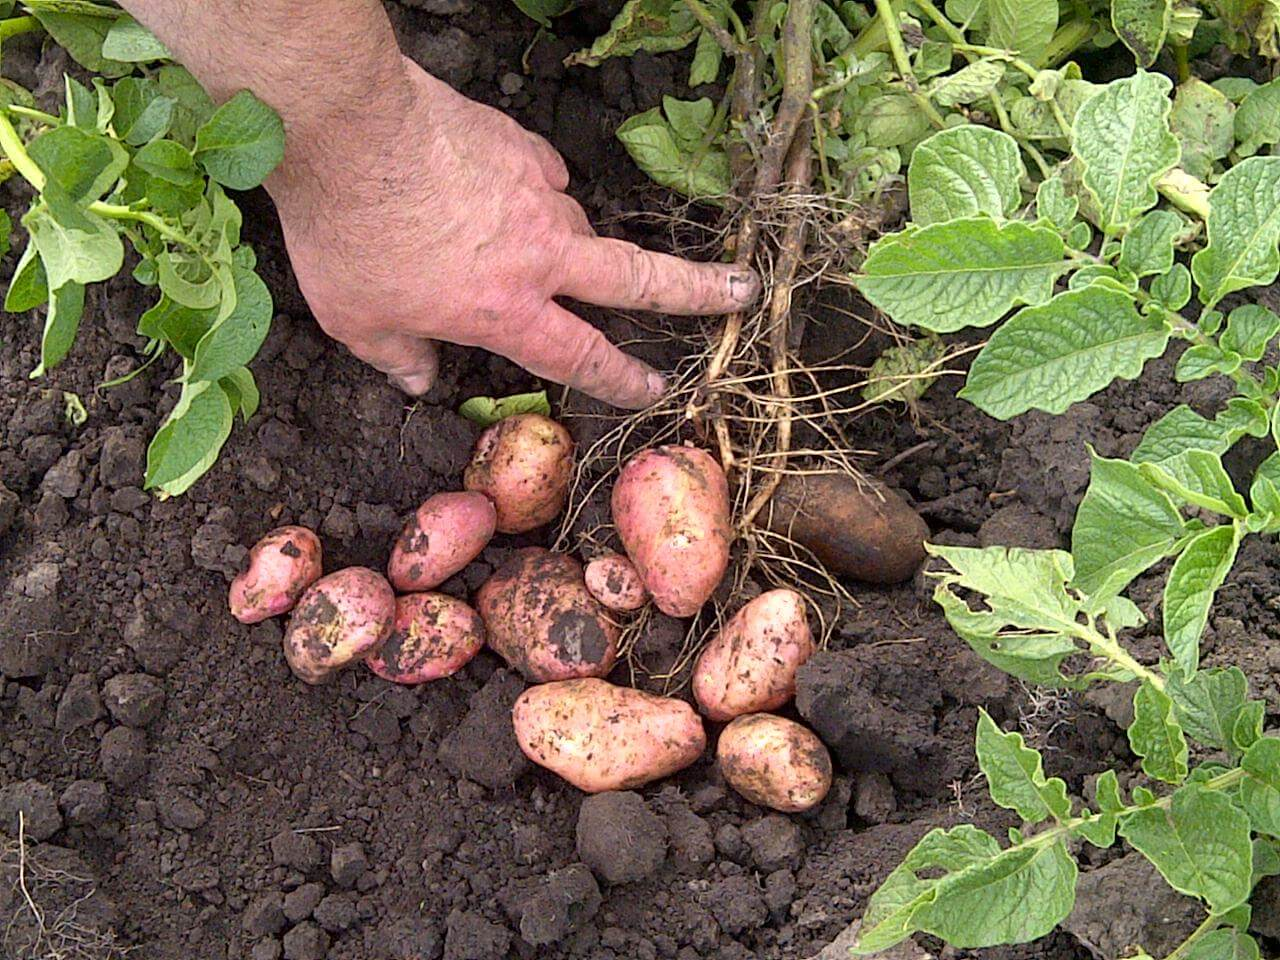 ᐉ картофель рогнеда описание сорта, характеристика, фото - orensad198.ru